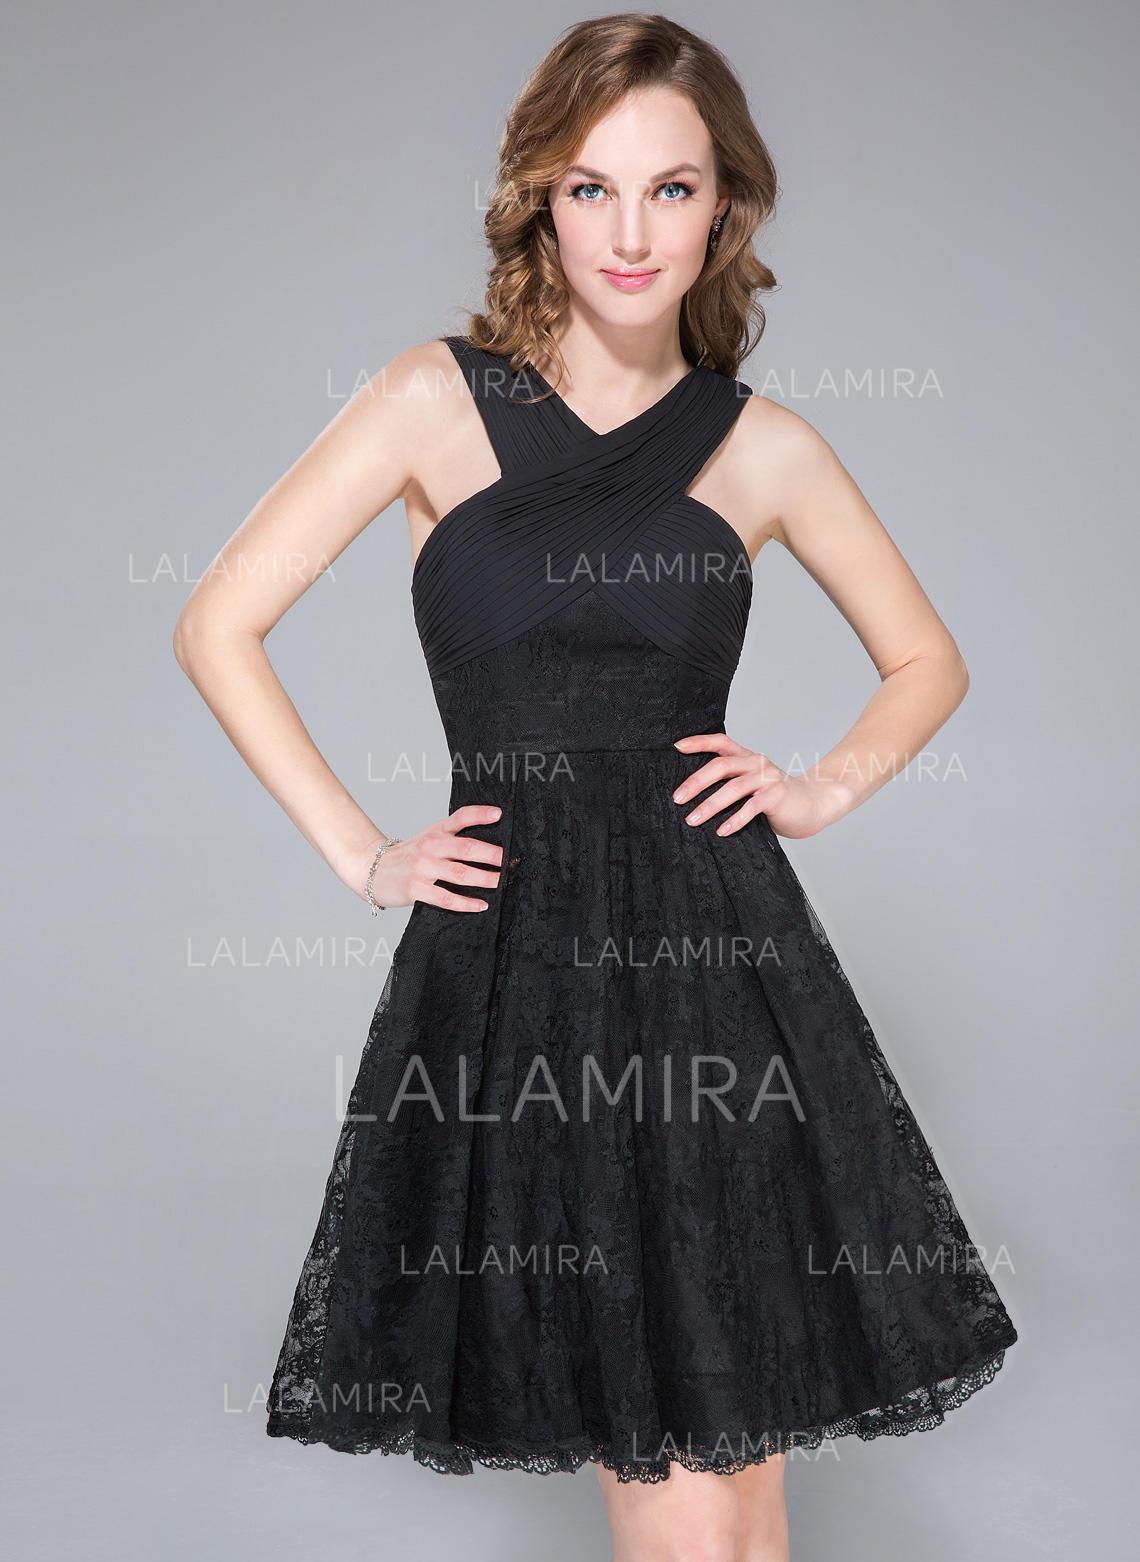 e581e3fda56f0 Fashion Chiffon Lace Regular Straps Sleeveless A-Line/Princess Cocktail  Dresses (016041150). Loading zoom